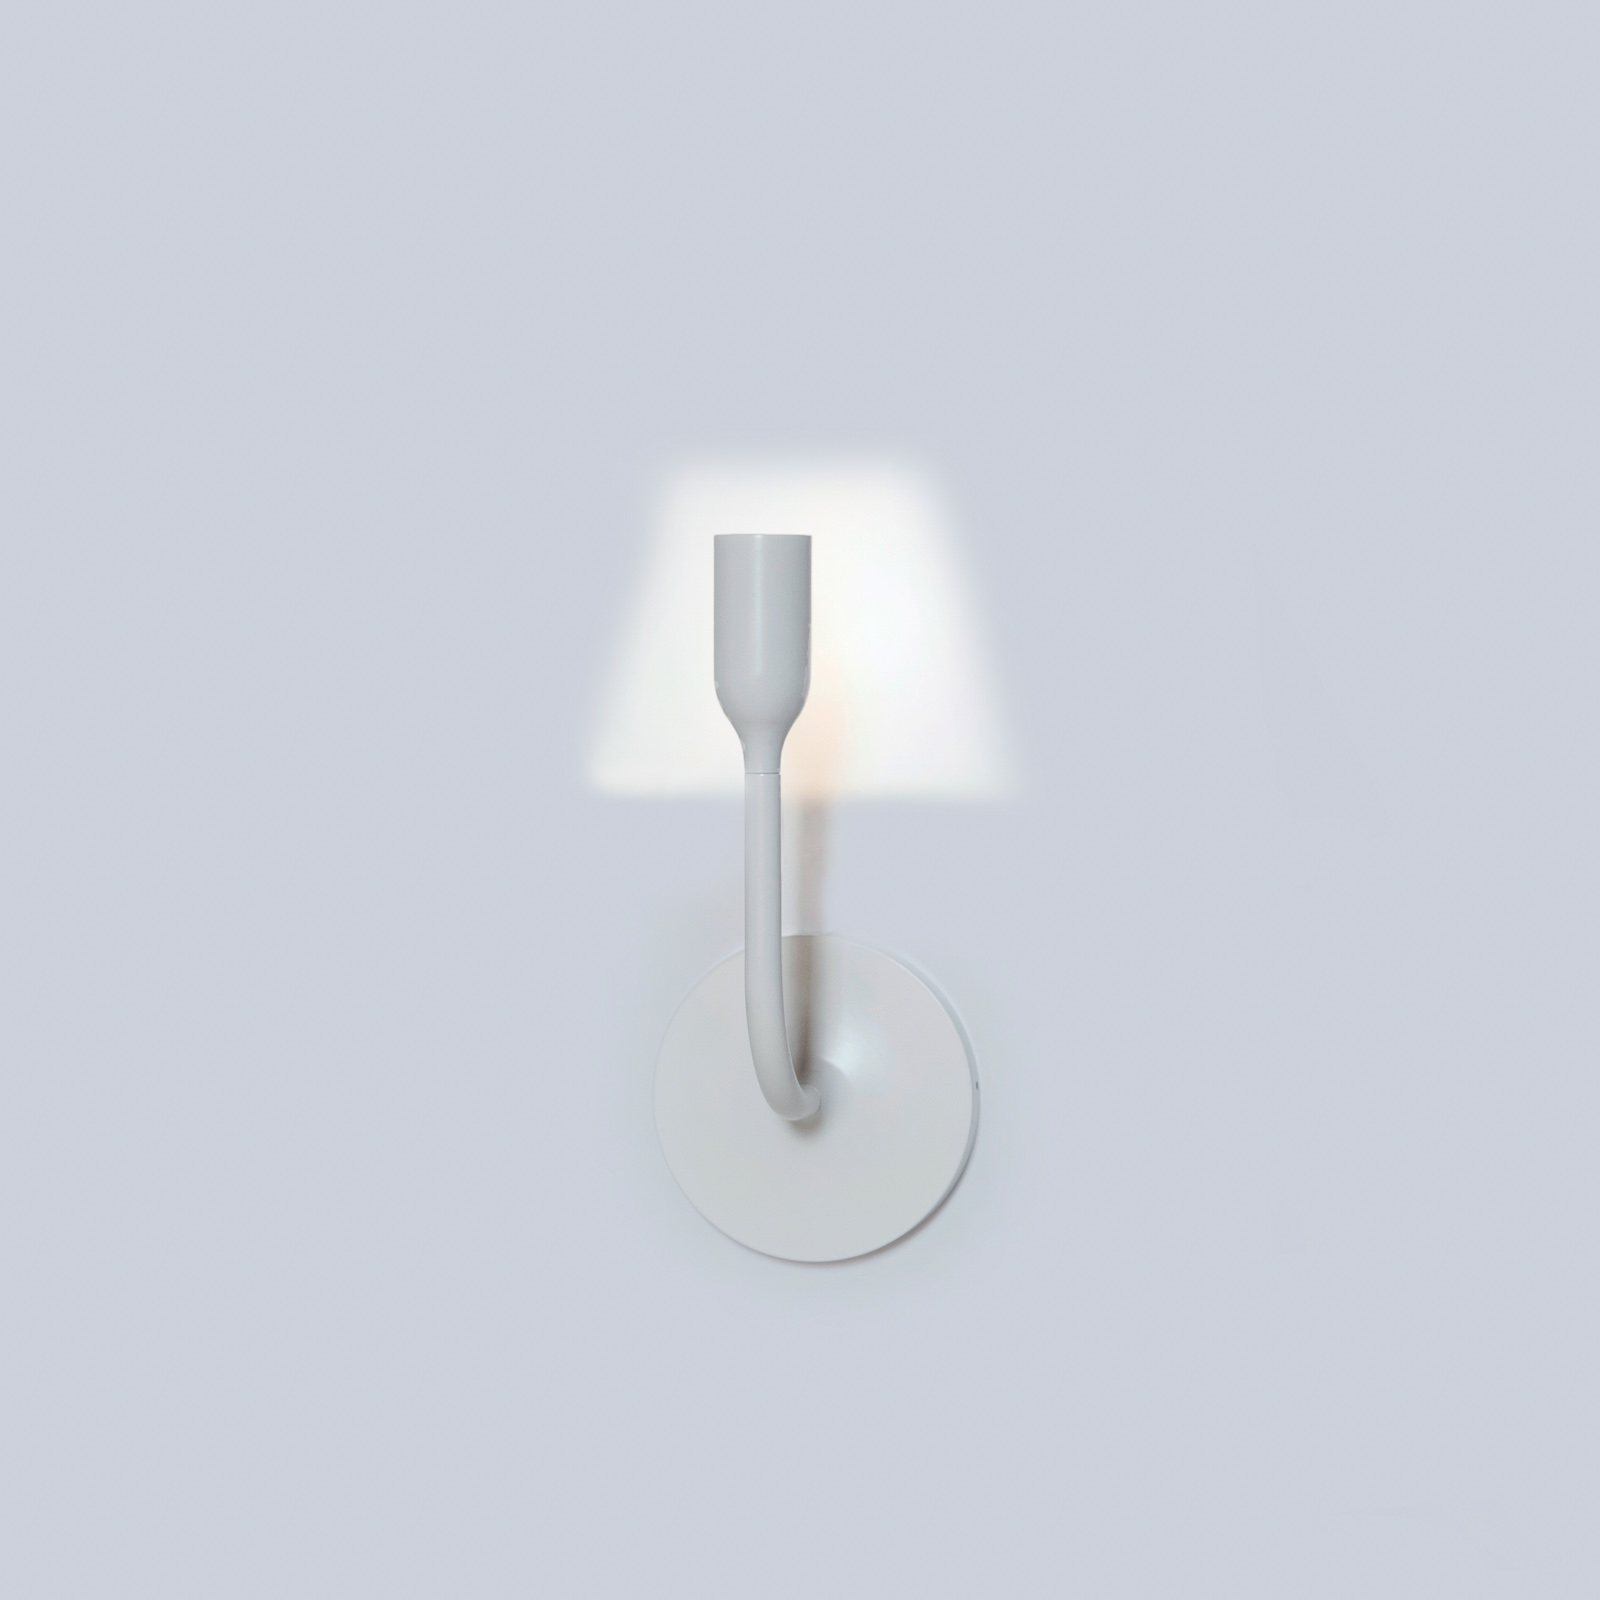 Innermost YOYWall LED wandlamp